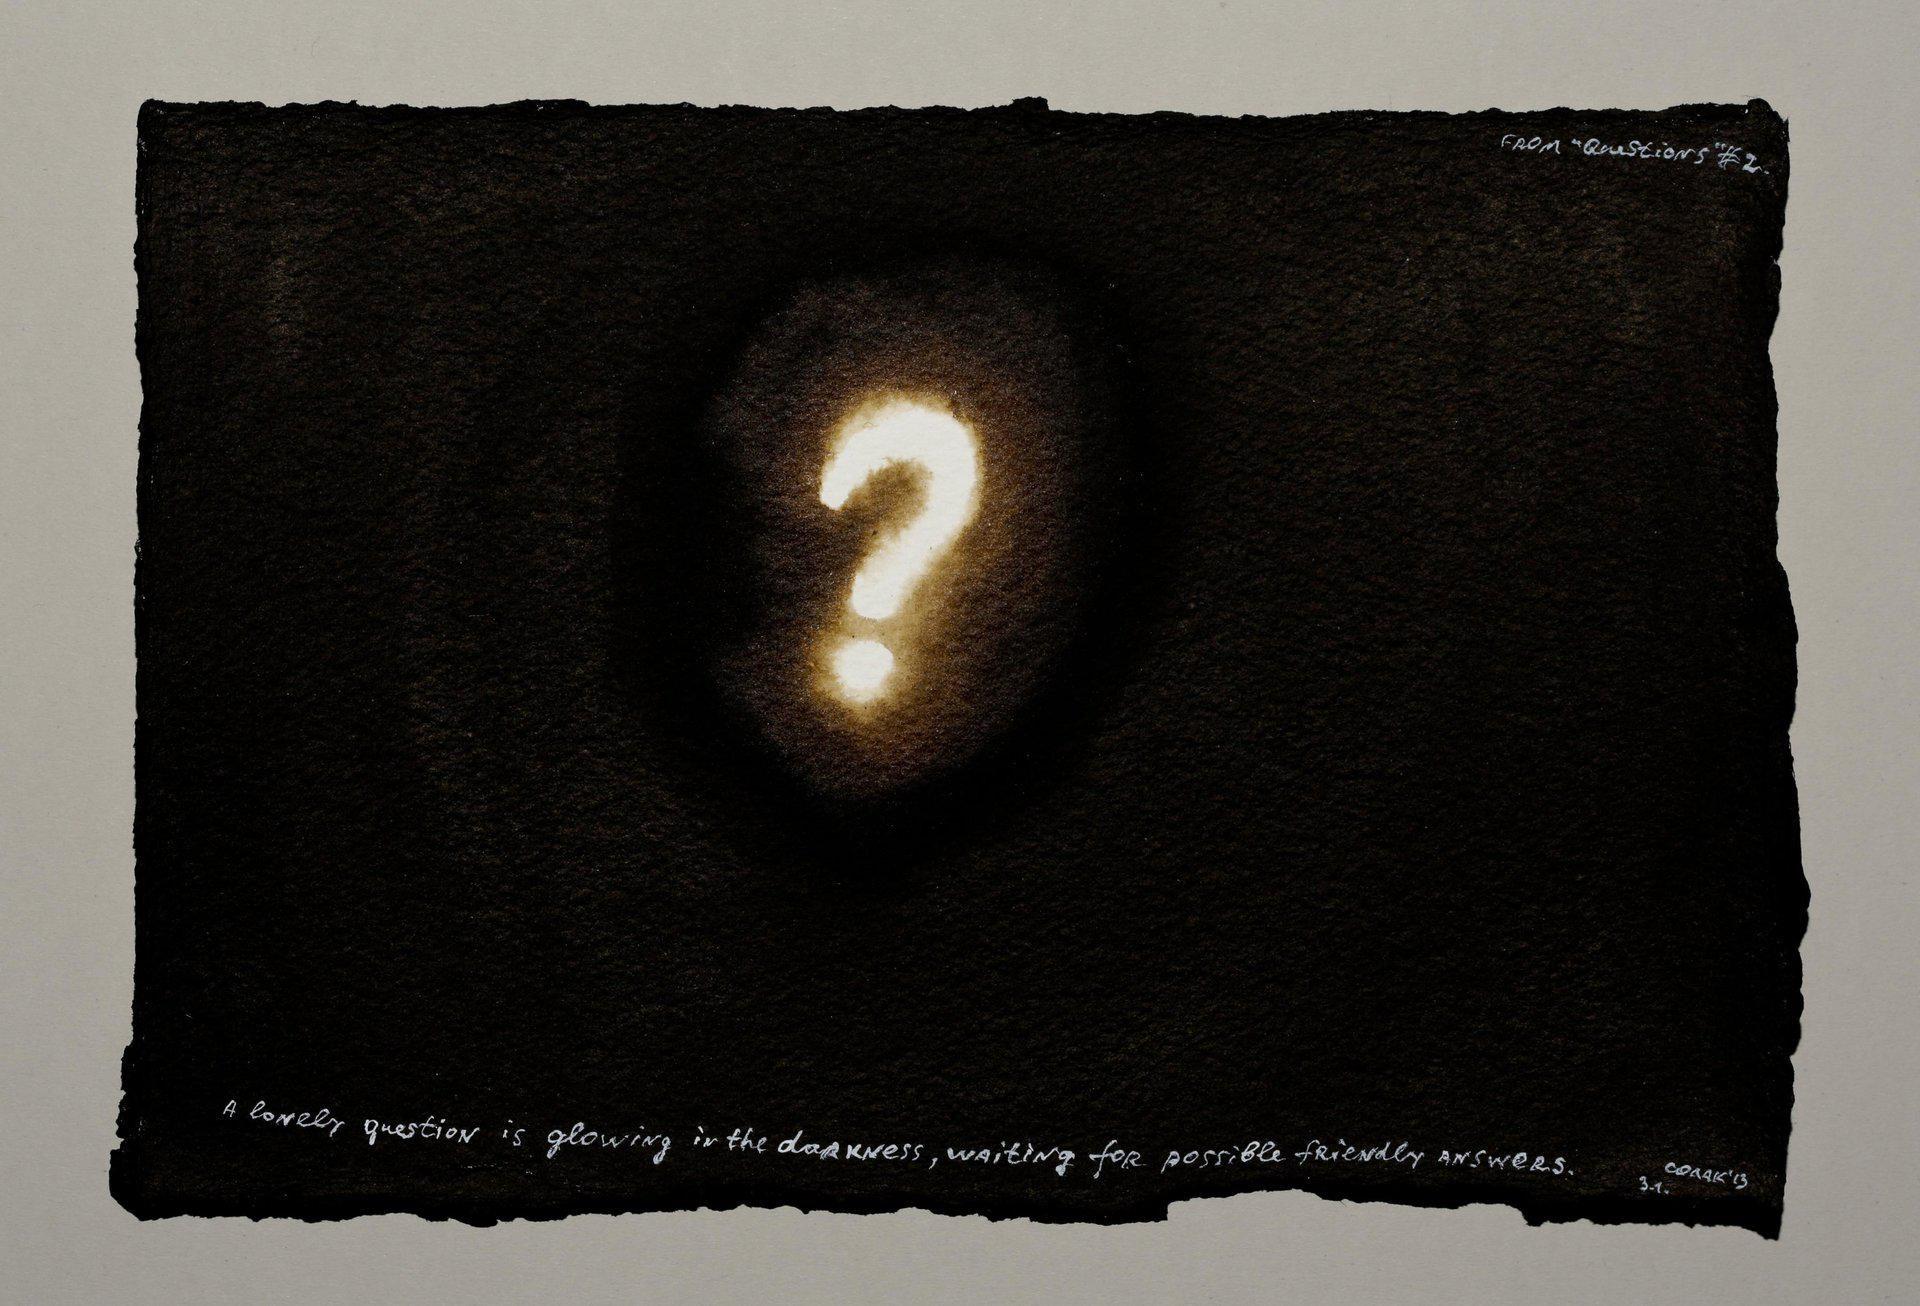 Nedko Solakov, Questions (2/12), 2013